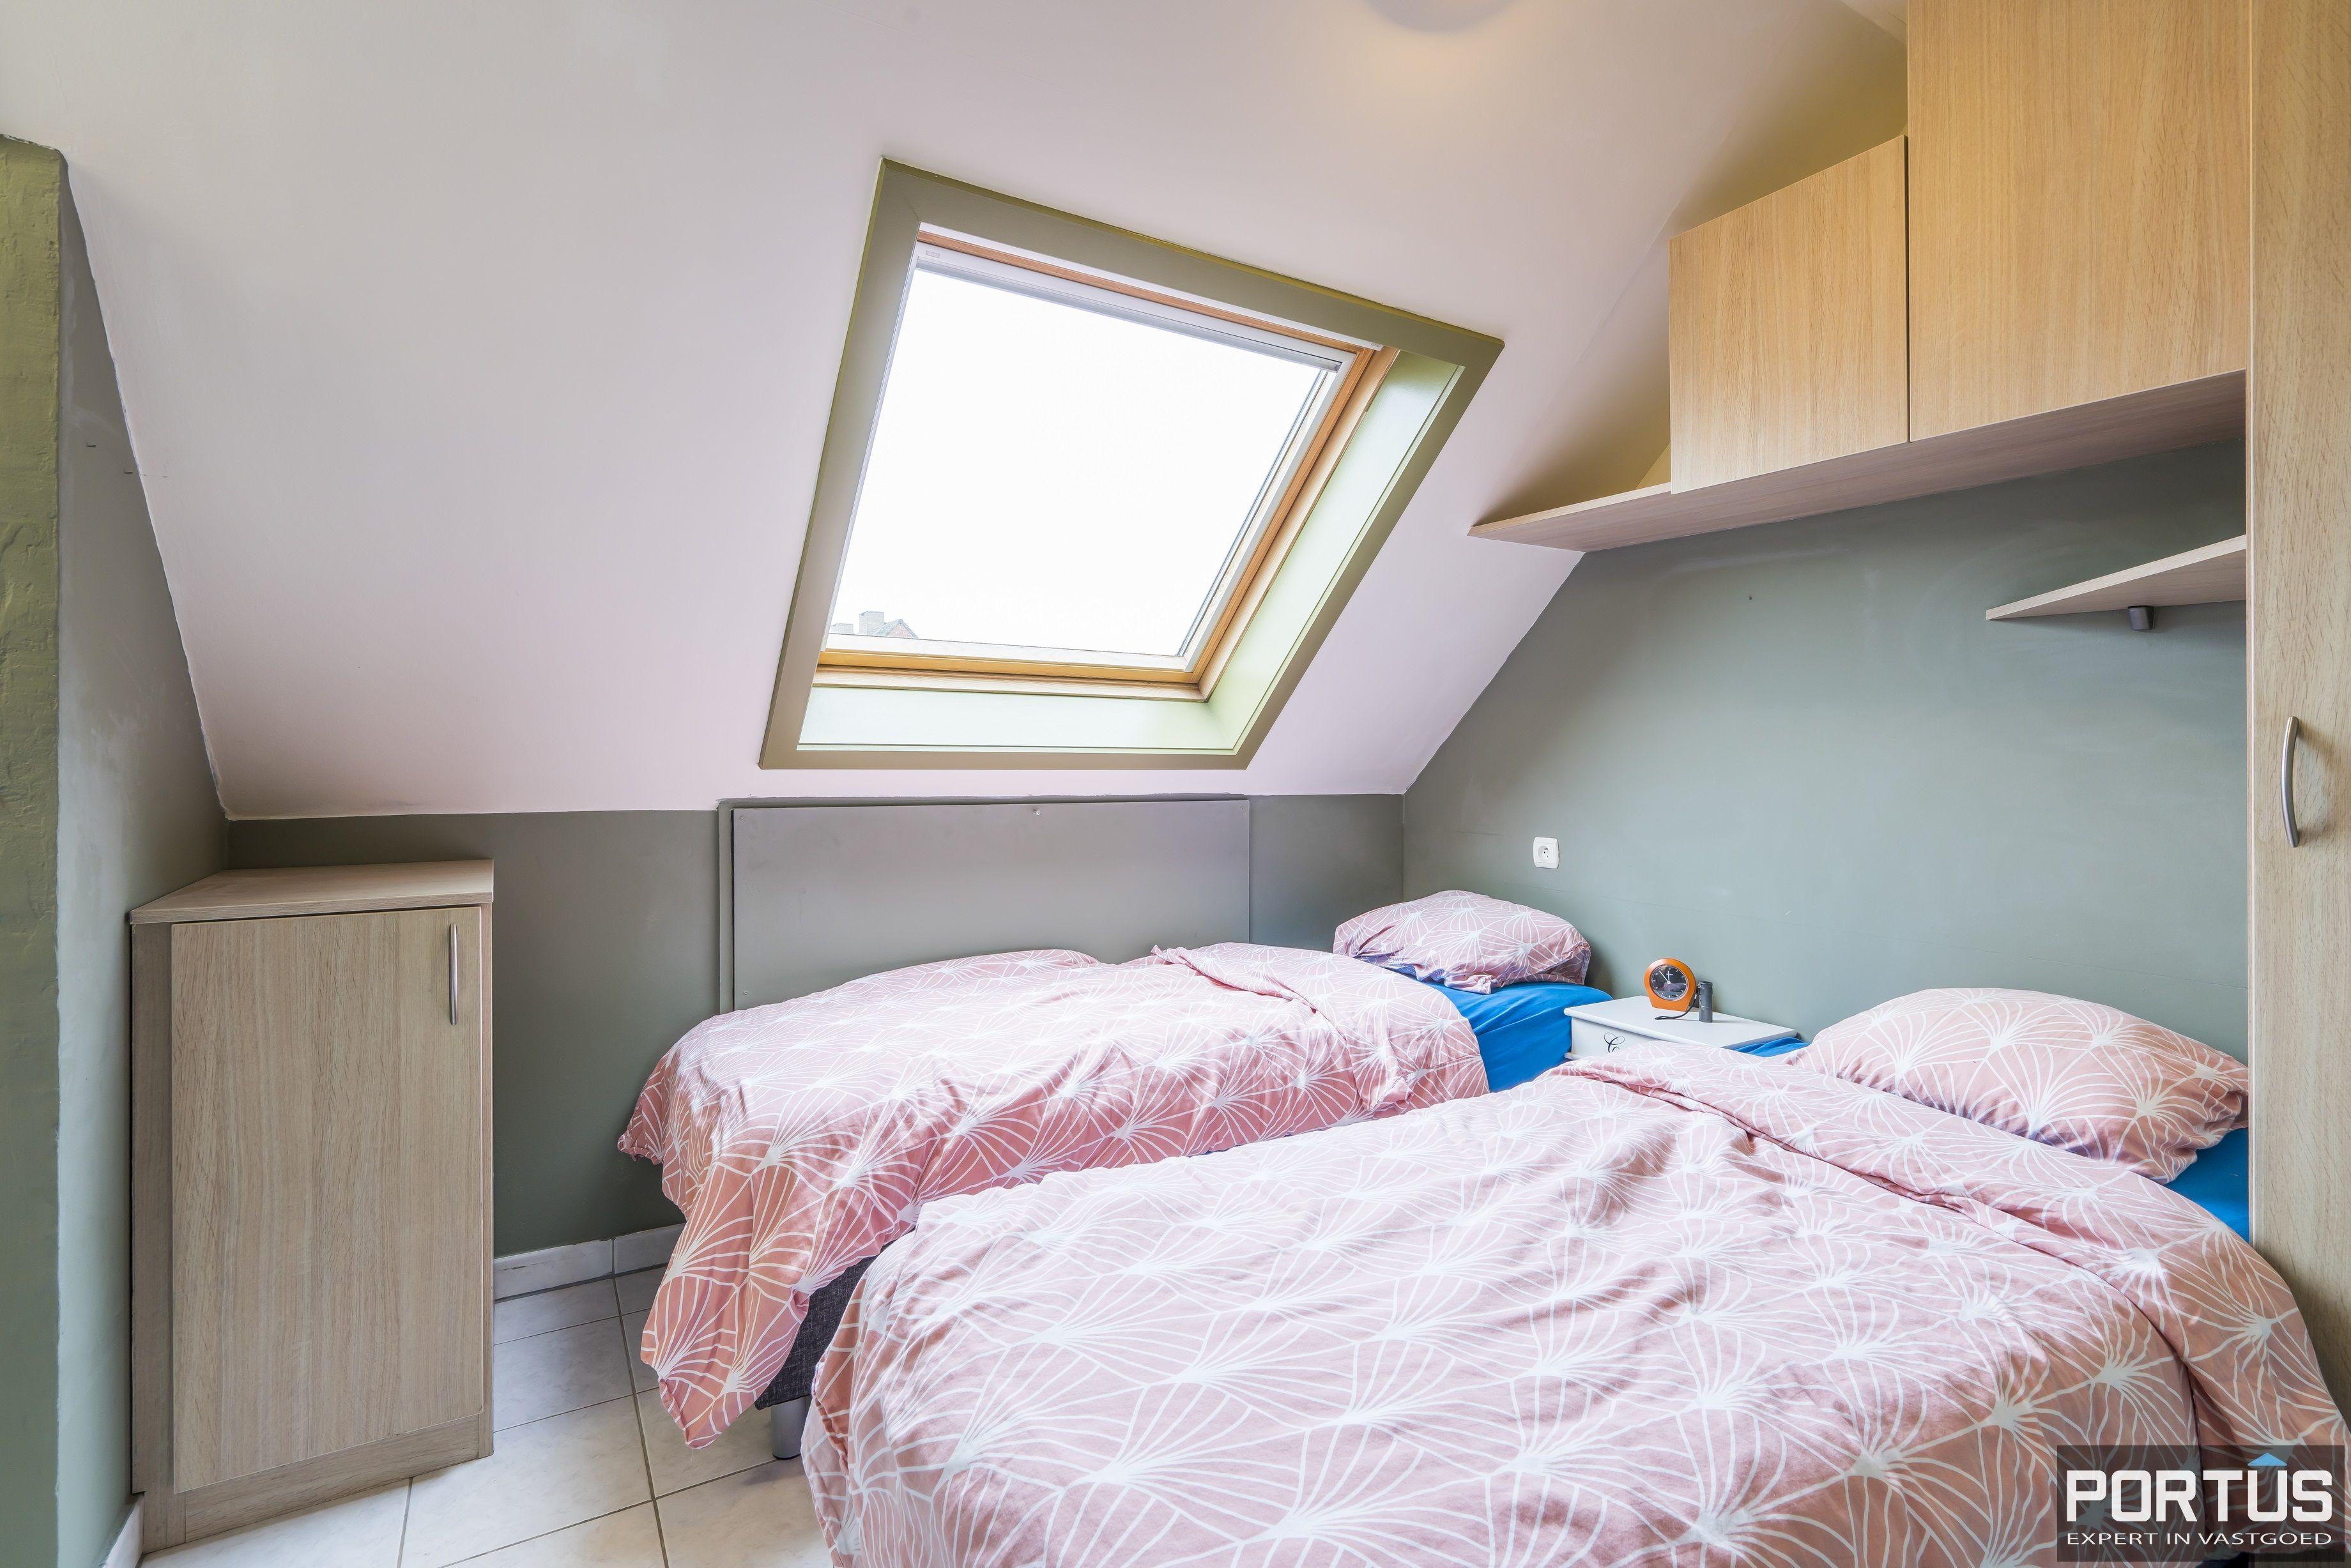 Instapklaar appartement met 1 slaapkamer te koop te Westende - 12044